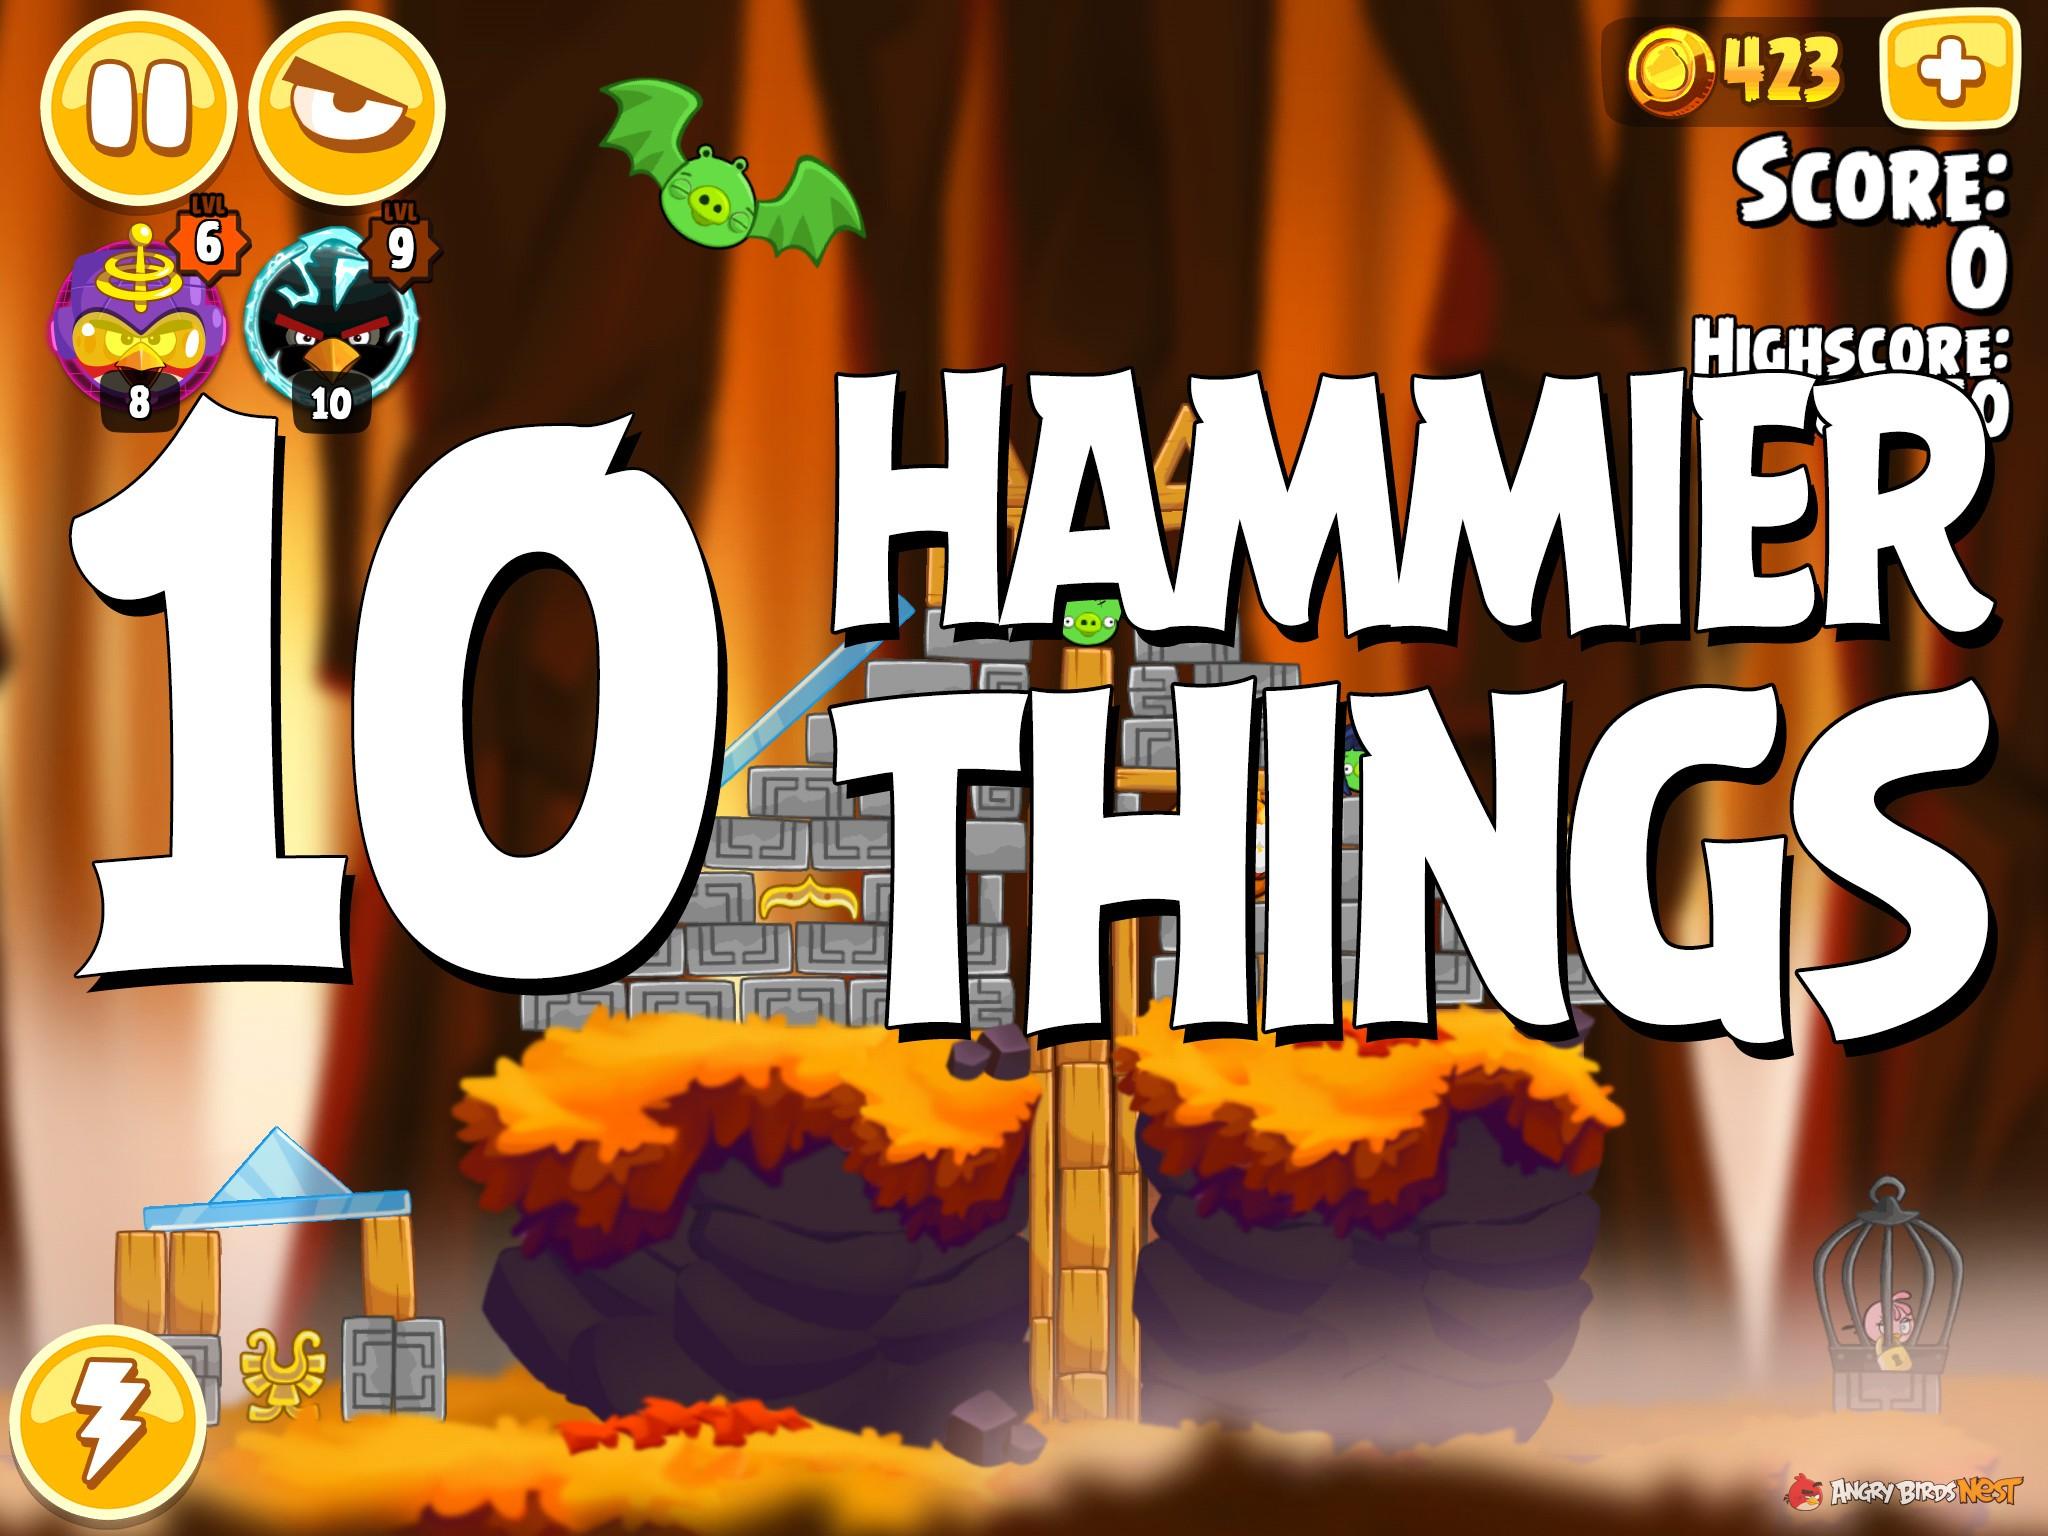 Angry Birds Hammier Things angry birds seasons hammier things level 1-10 walkthrough